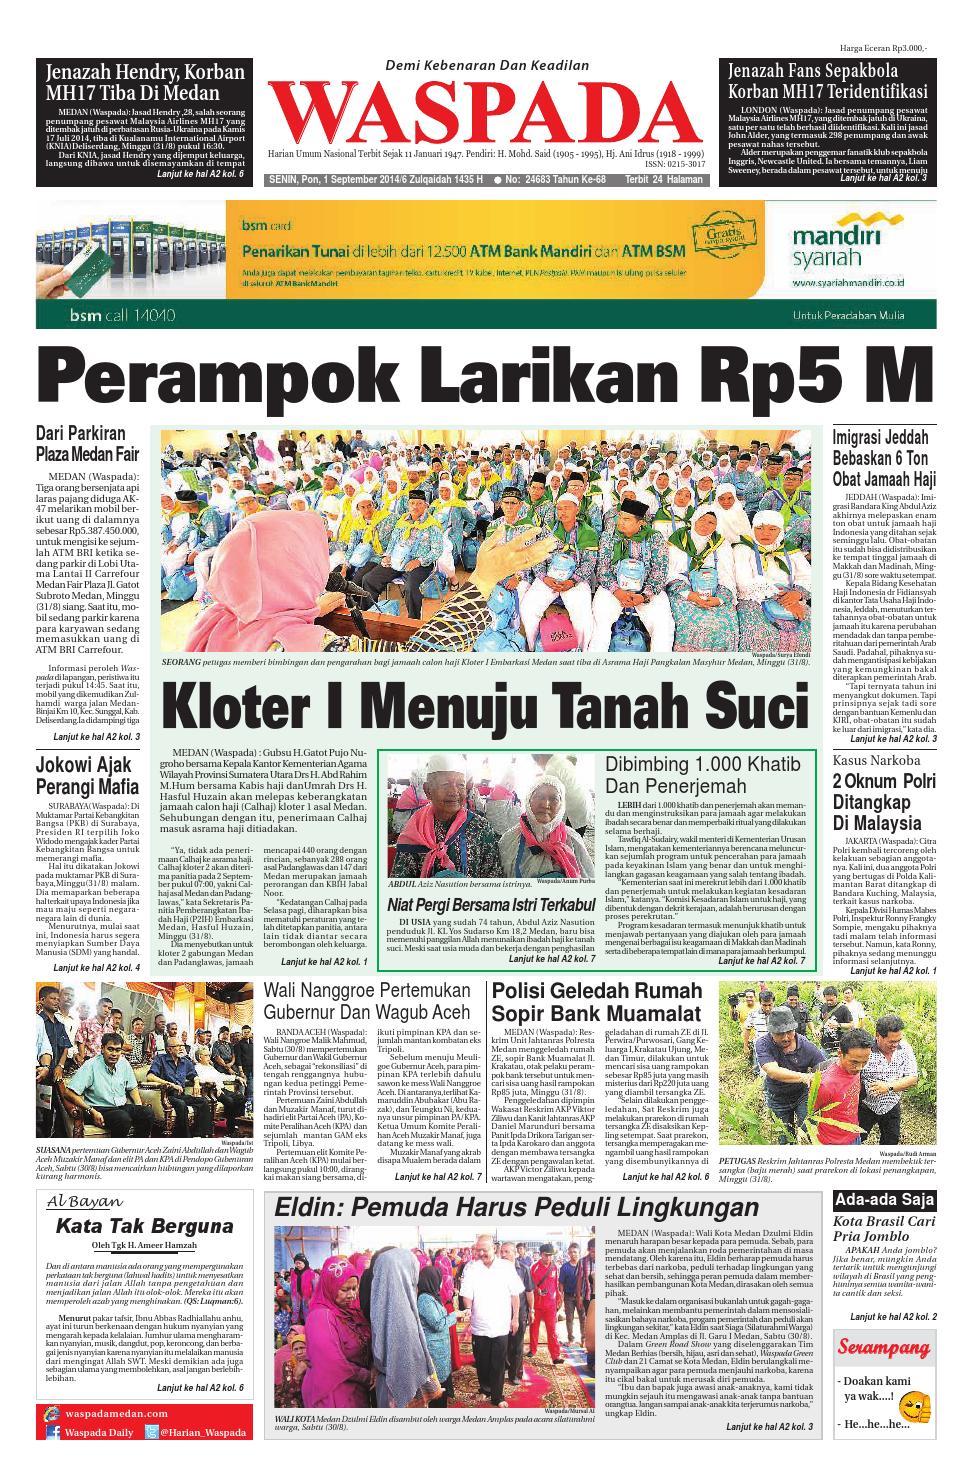 Waspada Senin 1 September 2014 By Harian Issuu Bri Produk Ukm Bumn Kain Doby Motif Bunga